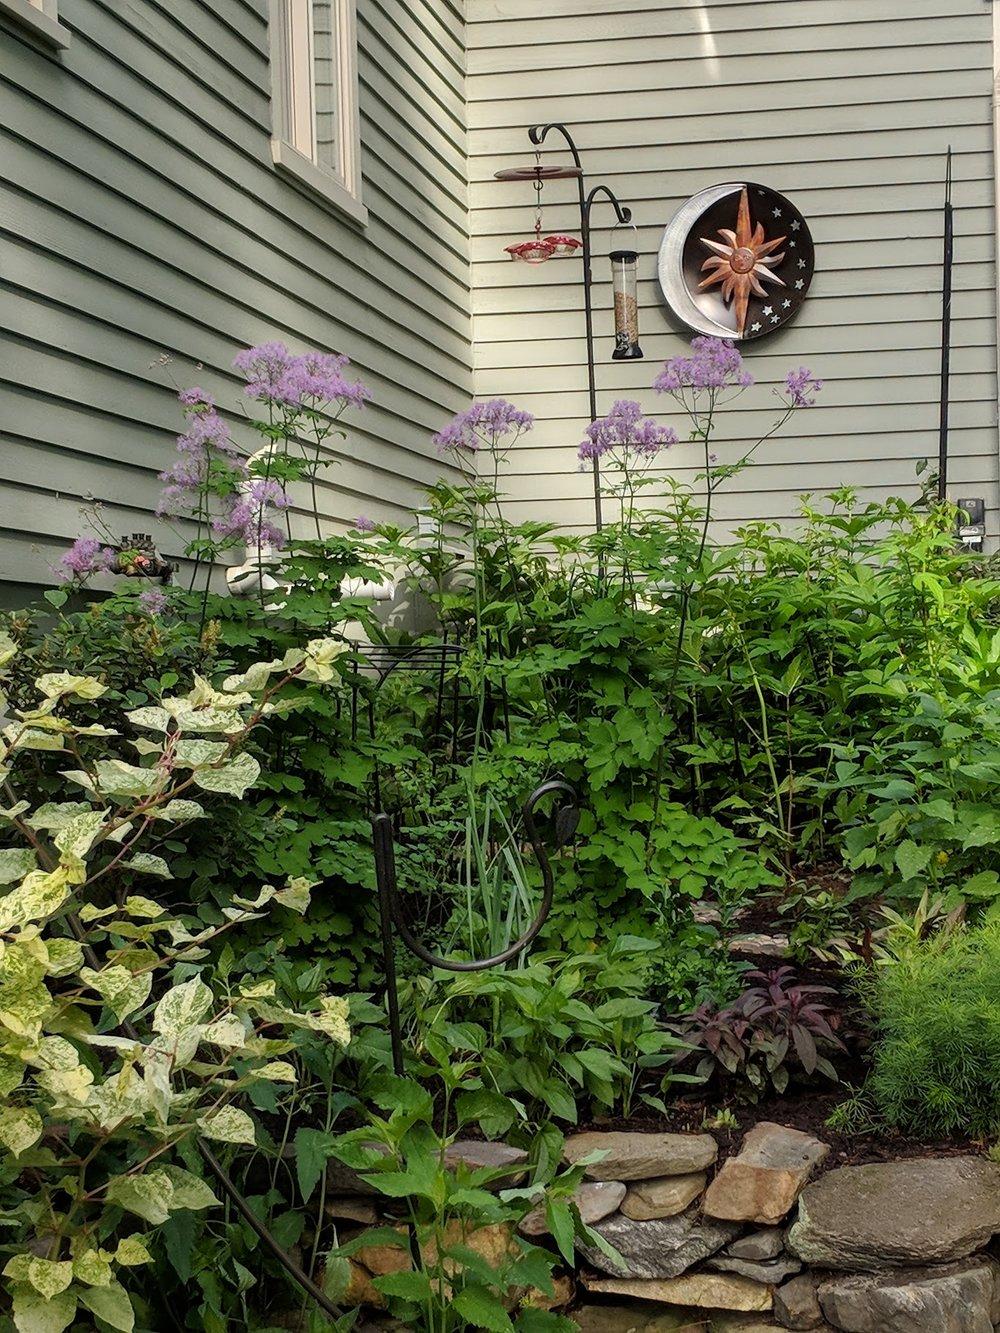 June 3: Thalictrum aqualegiifolium (meadow rue) provides early color